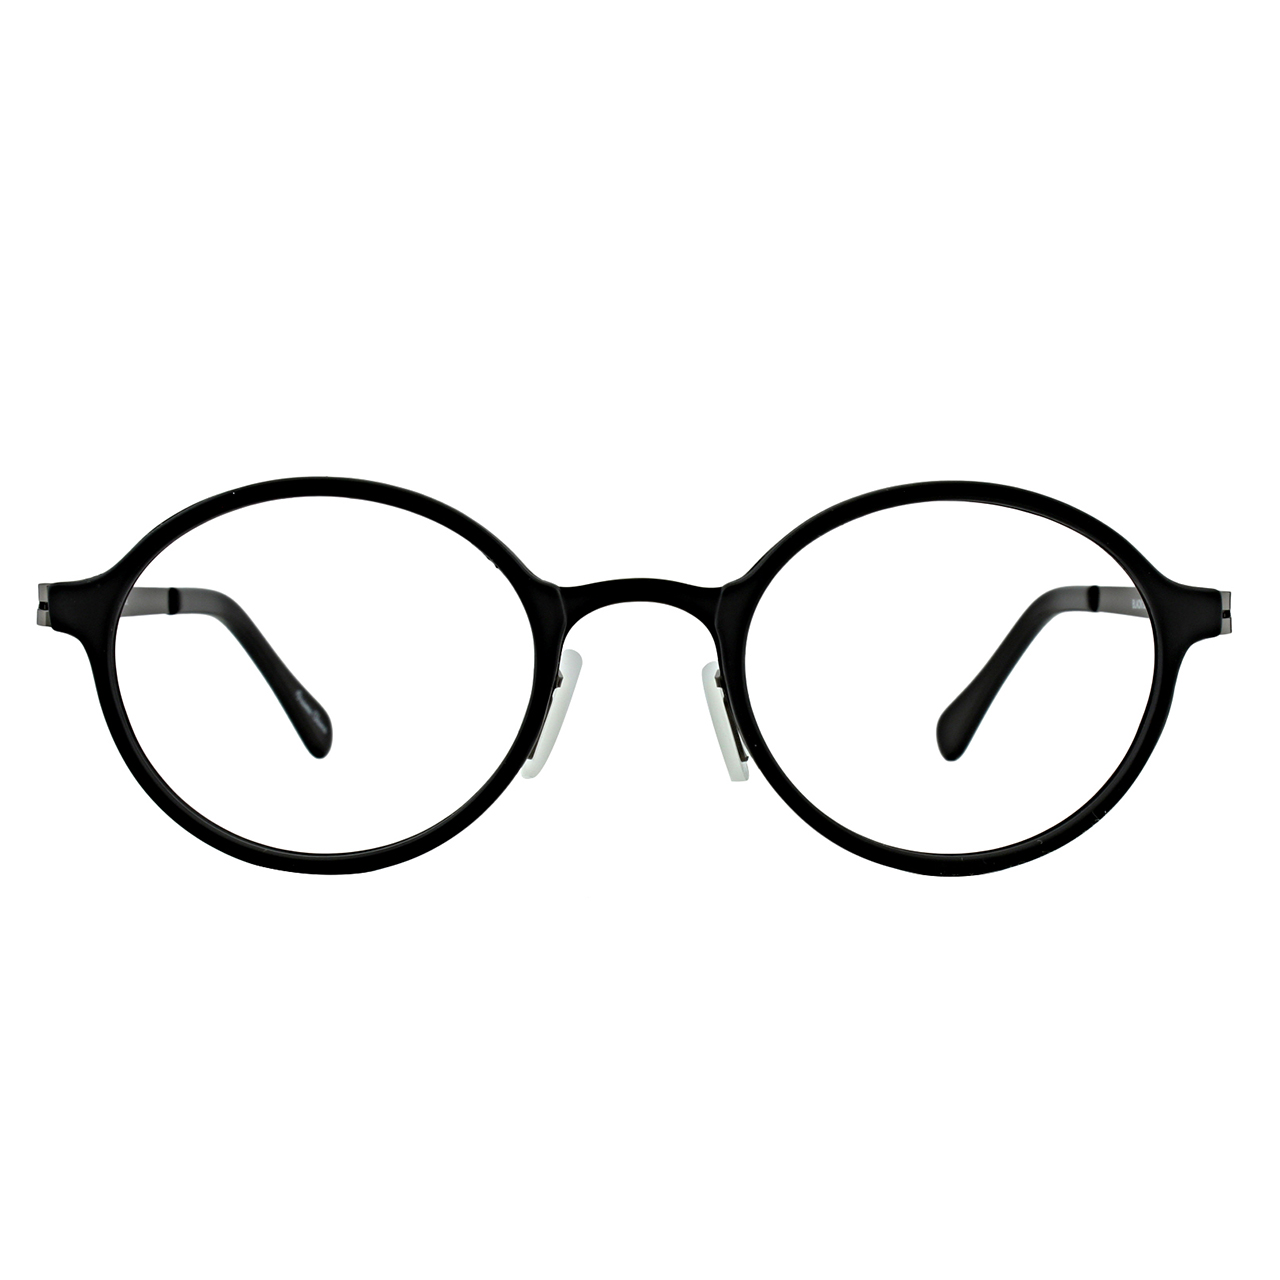 Affordable + Stylish Designer Round Glasses | Rx Eyeglasses and ...